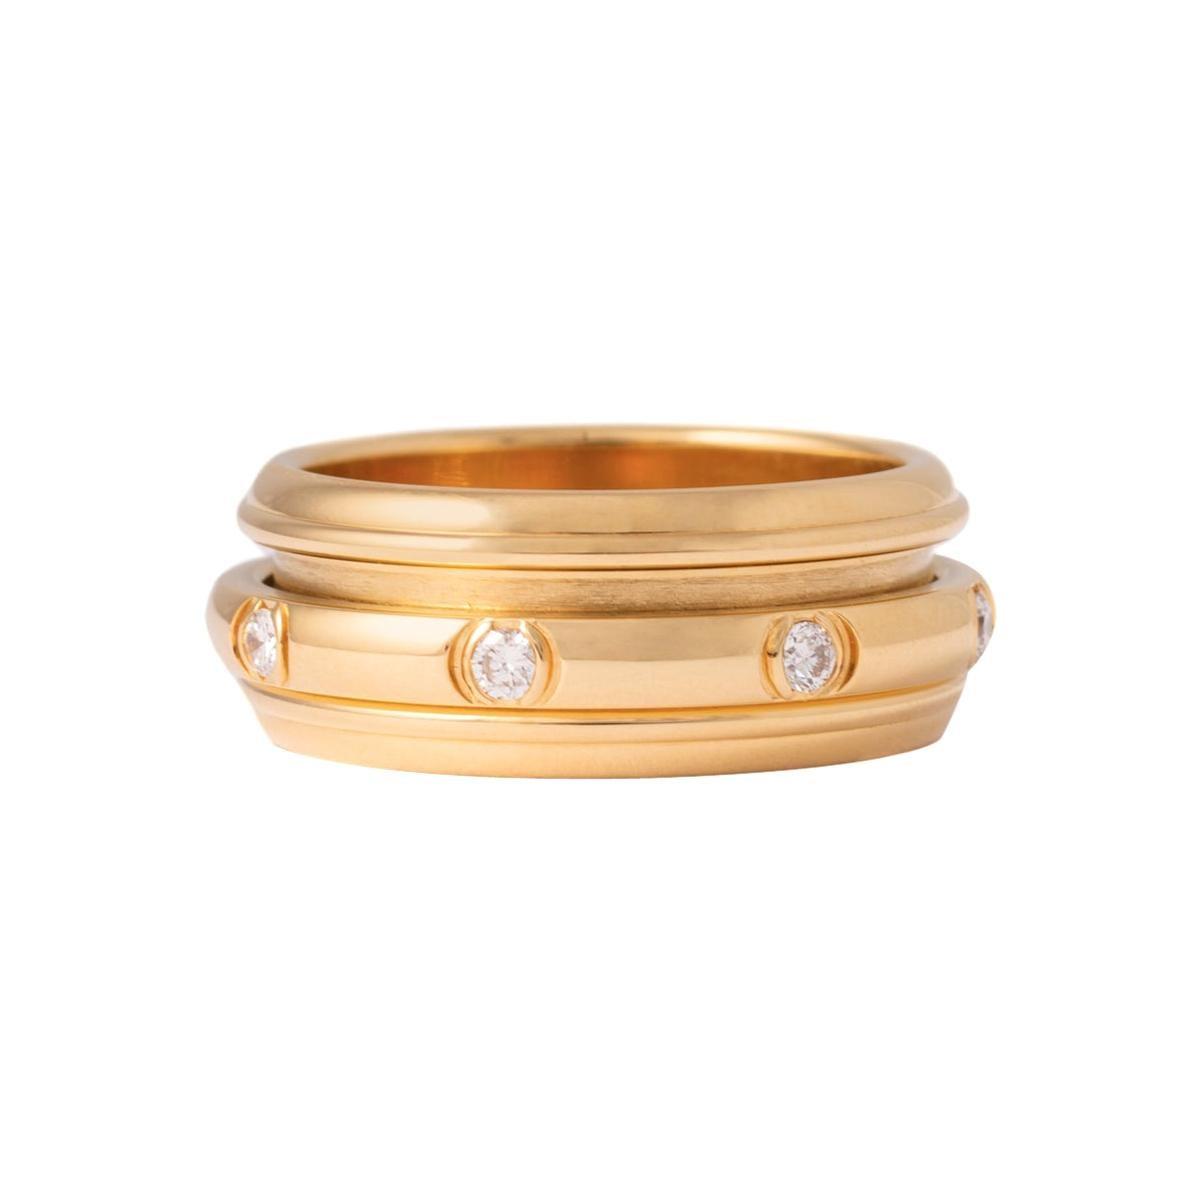 Piaget Possession Diamonds Yellow Gold Band Ring